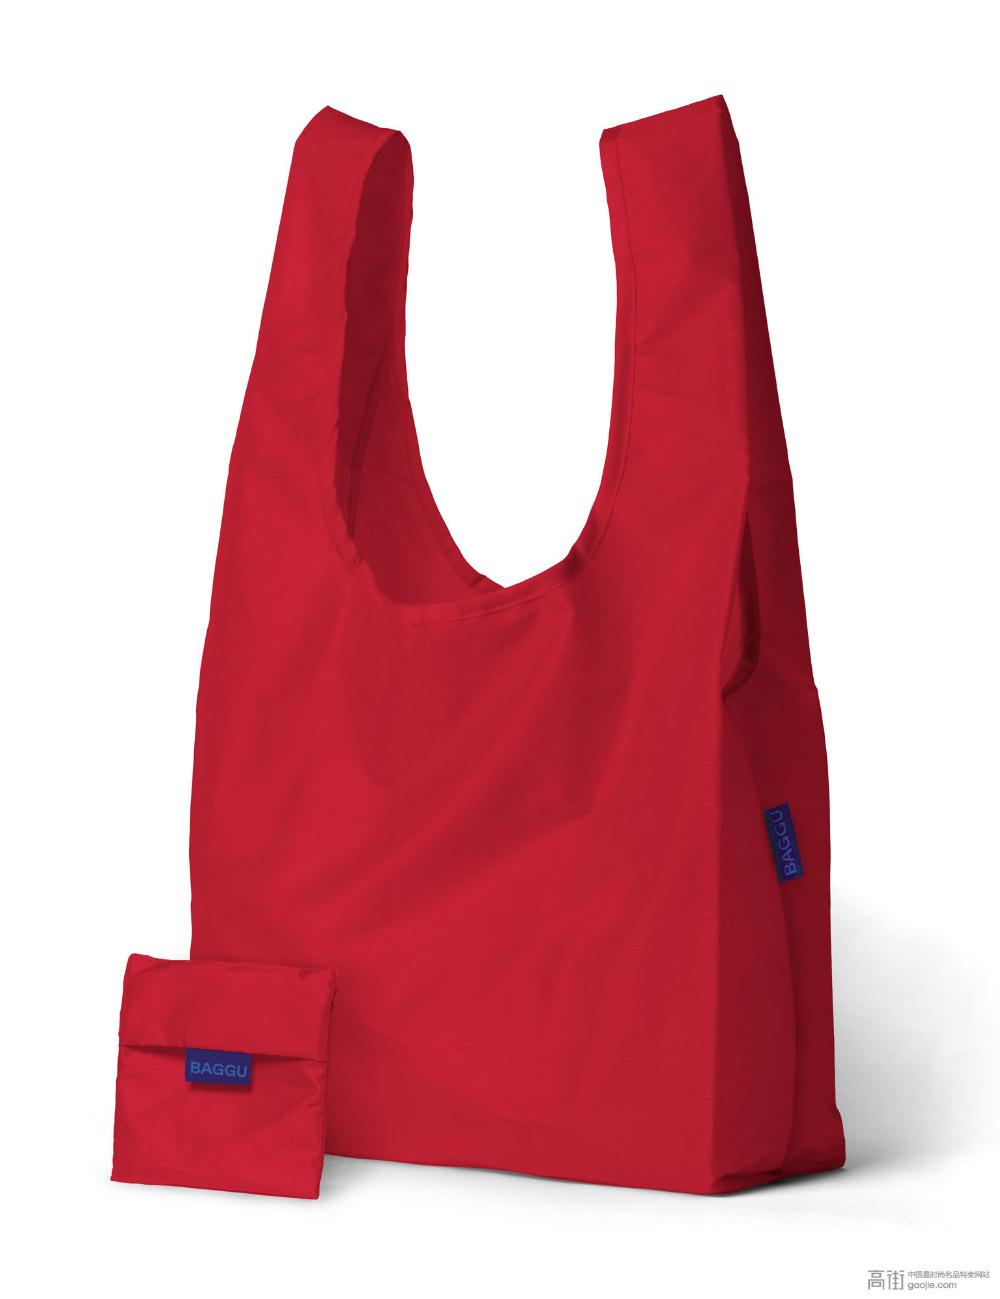 High Quality Zipper Baggu Bag Promotion-Shop for High Quality ...